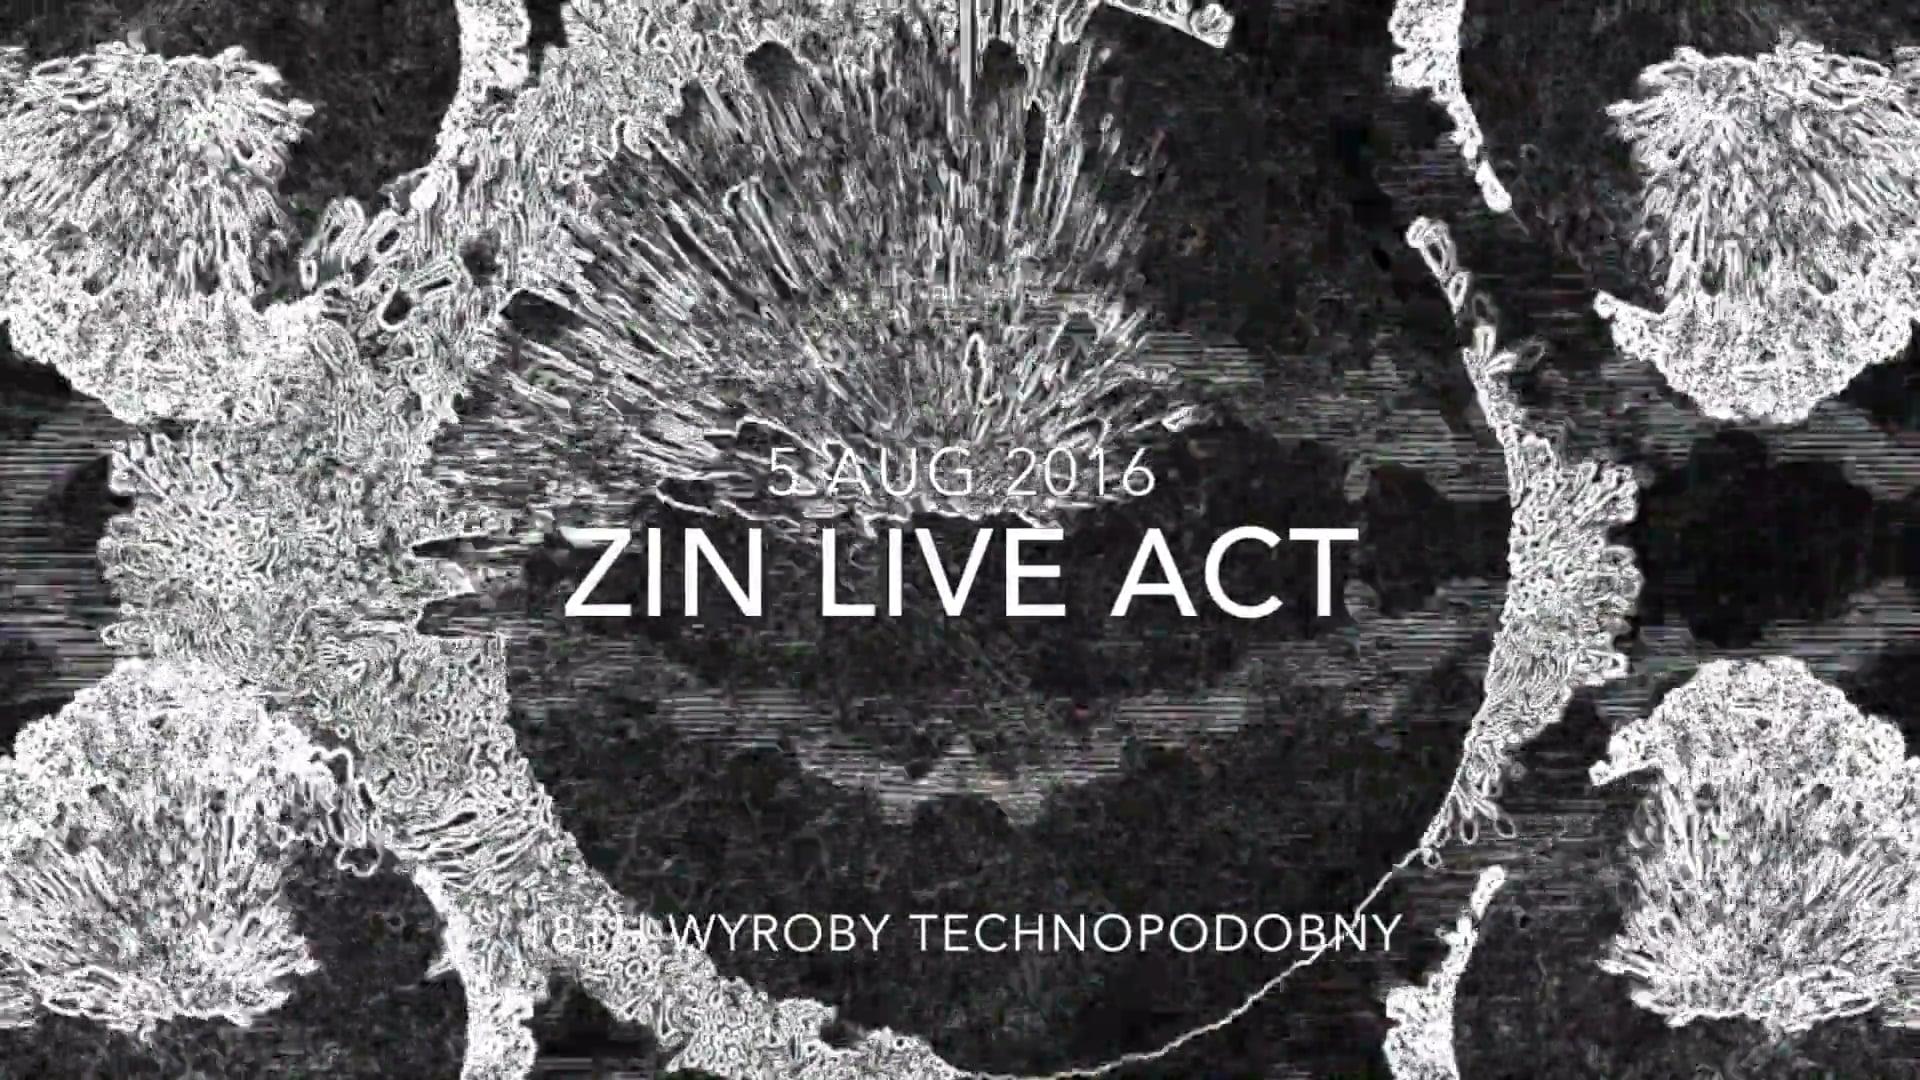 VJ Live Act 18th Wyroby technopodobne